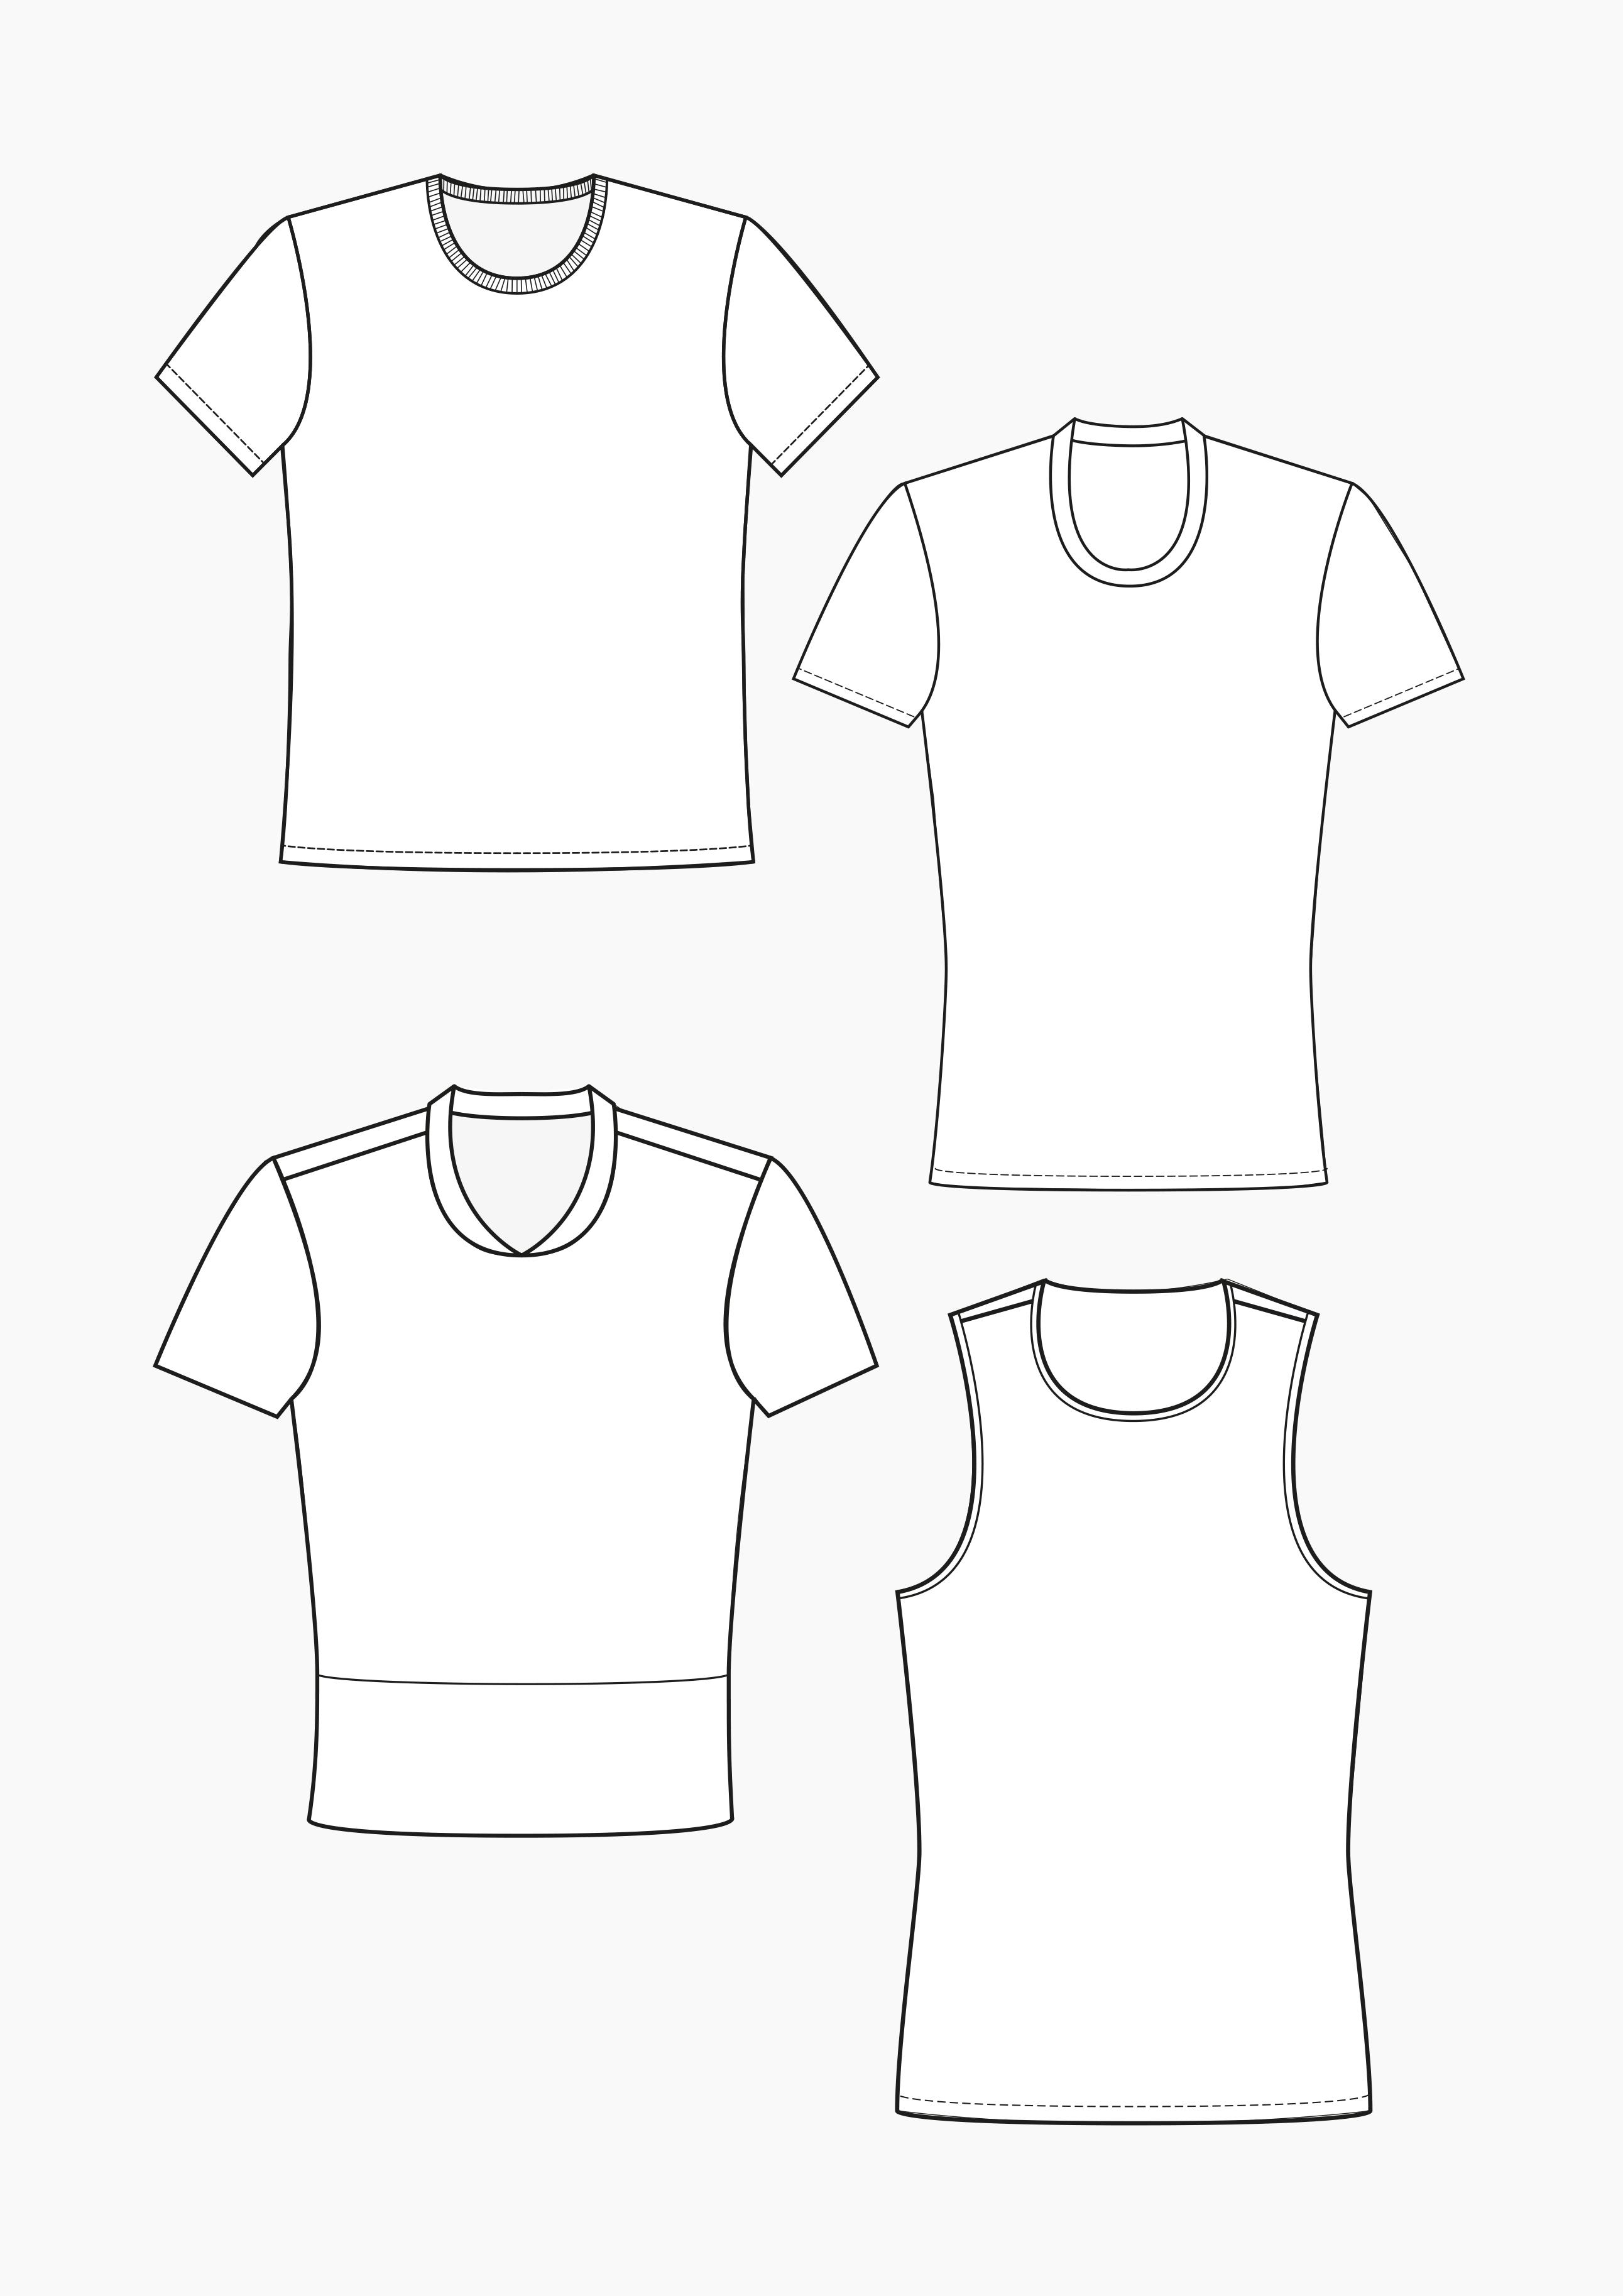 Produkt: Schnitt-Technik T-Shirt & Top für Herren